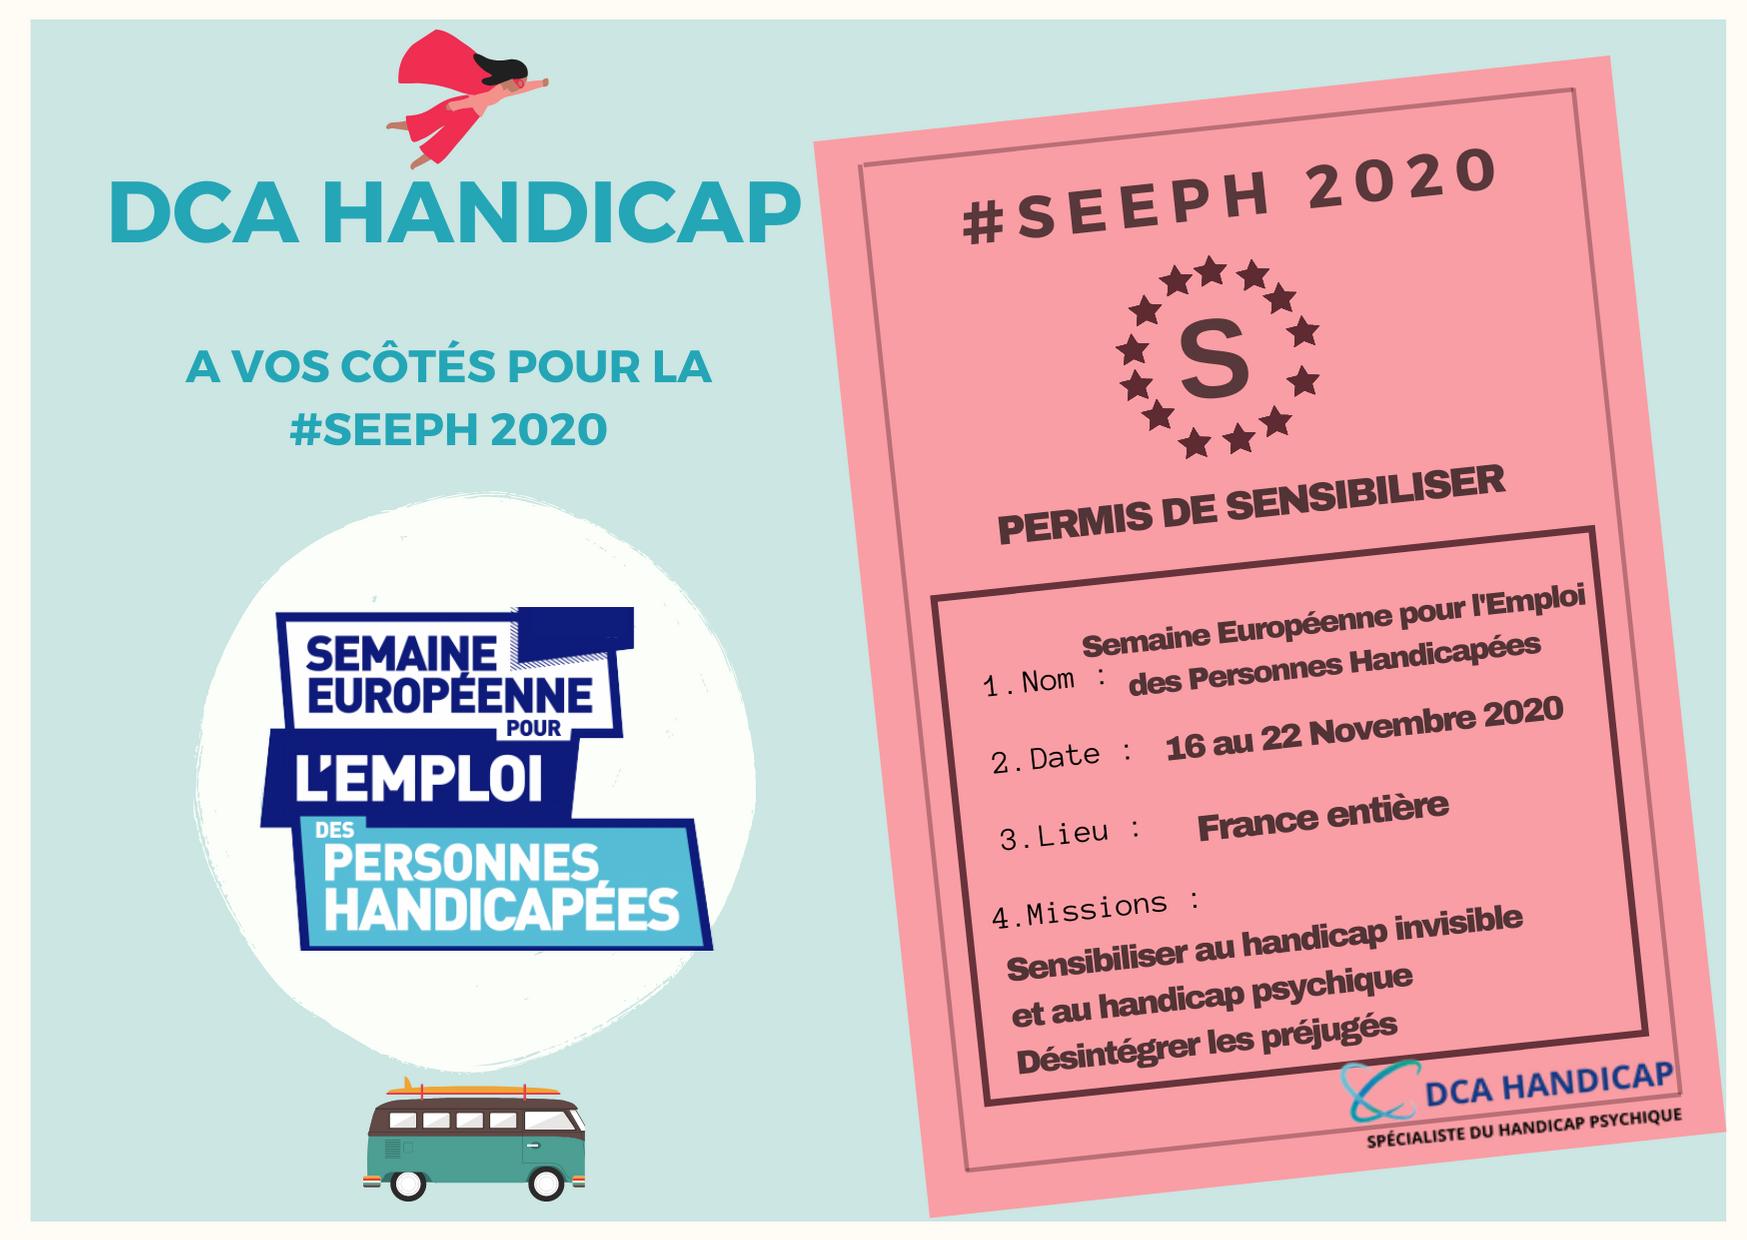 Sensibilisation handicap invisible, handicap psychique, SEEPH 2020